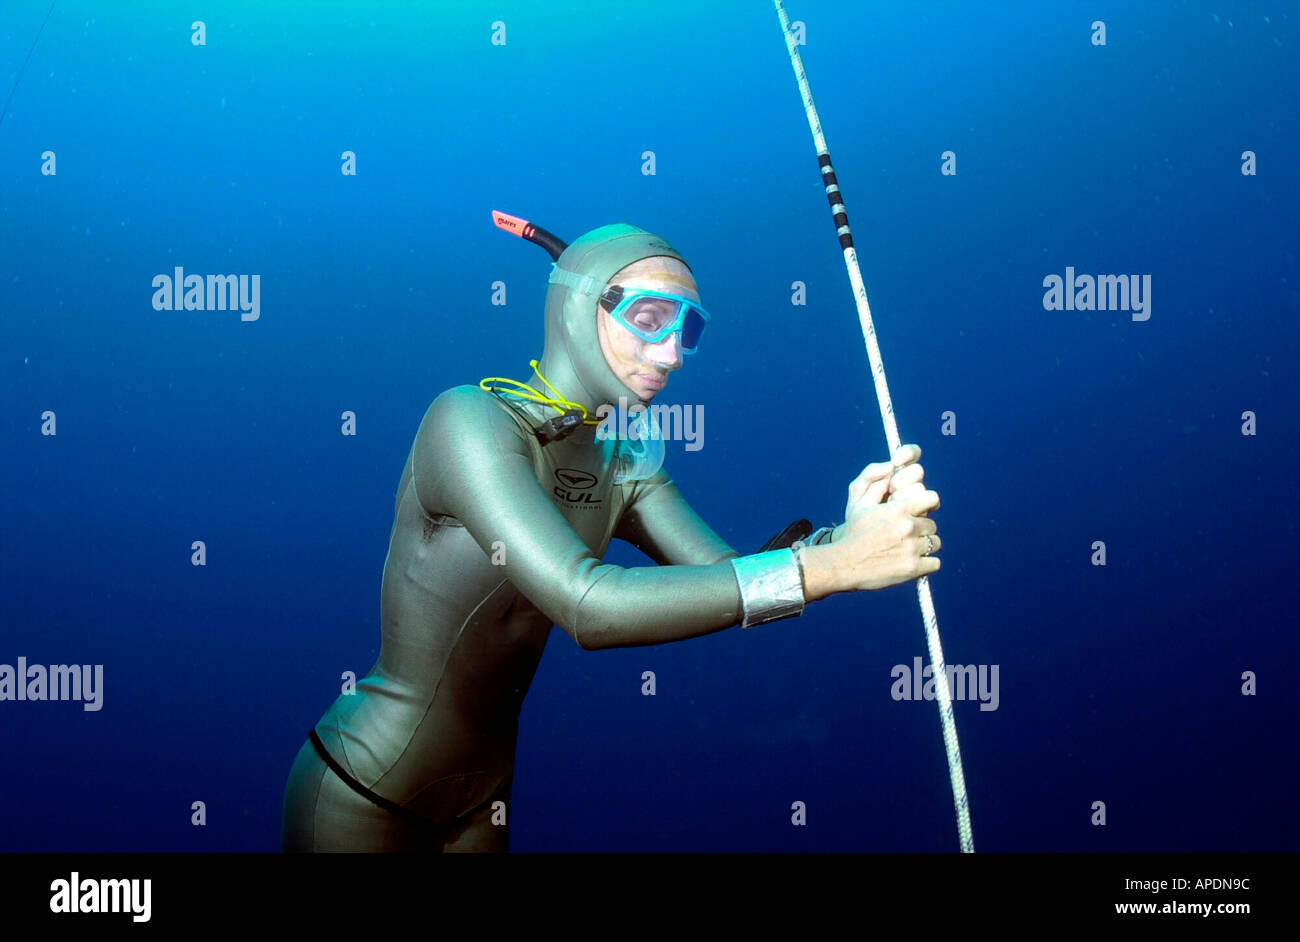 Tanya Streeter Breaks The Freediving World Depth Record